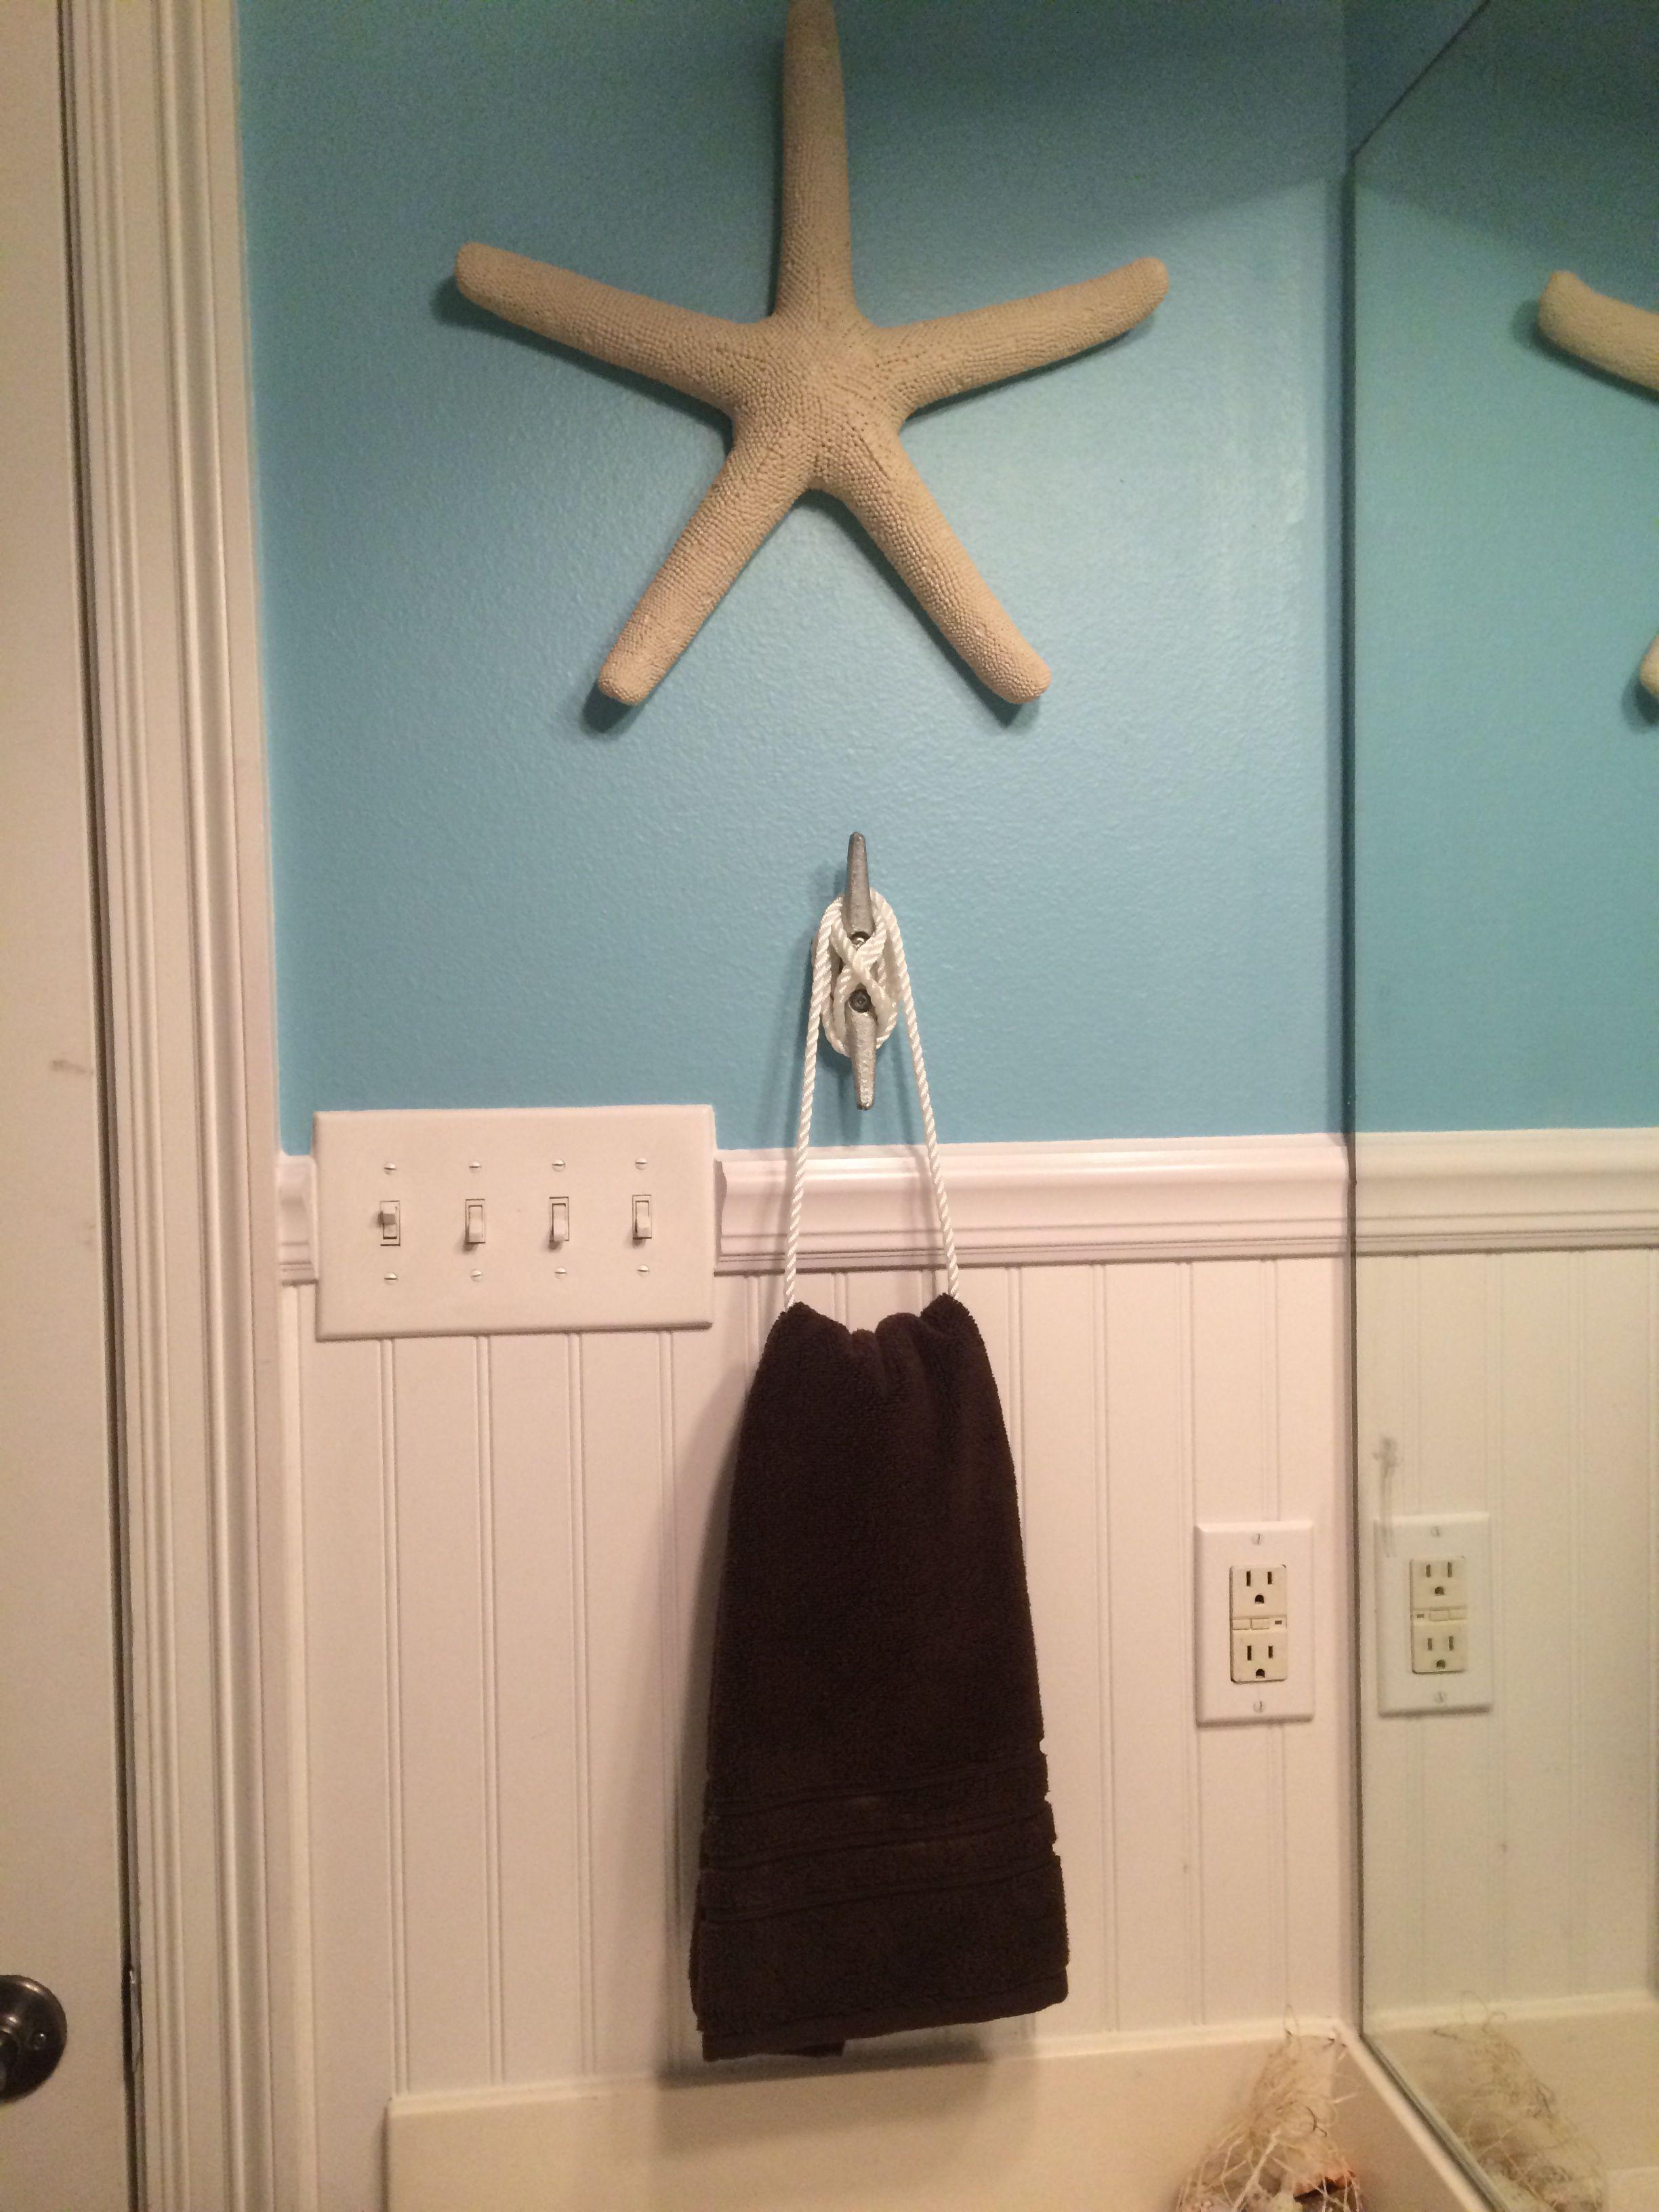 Nautical Or Beach Themed Bathroom Hand Towel Holder I Can Be